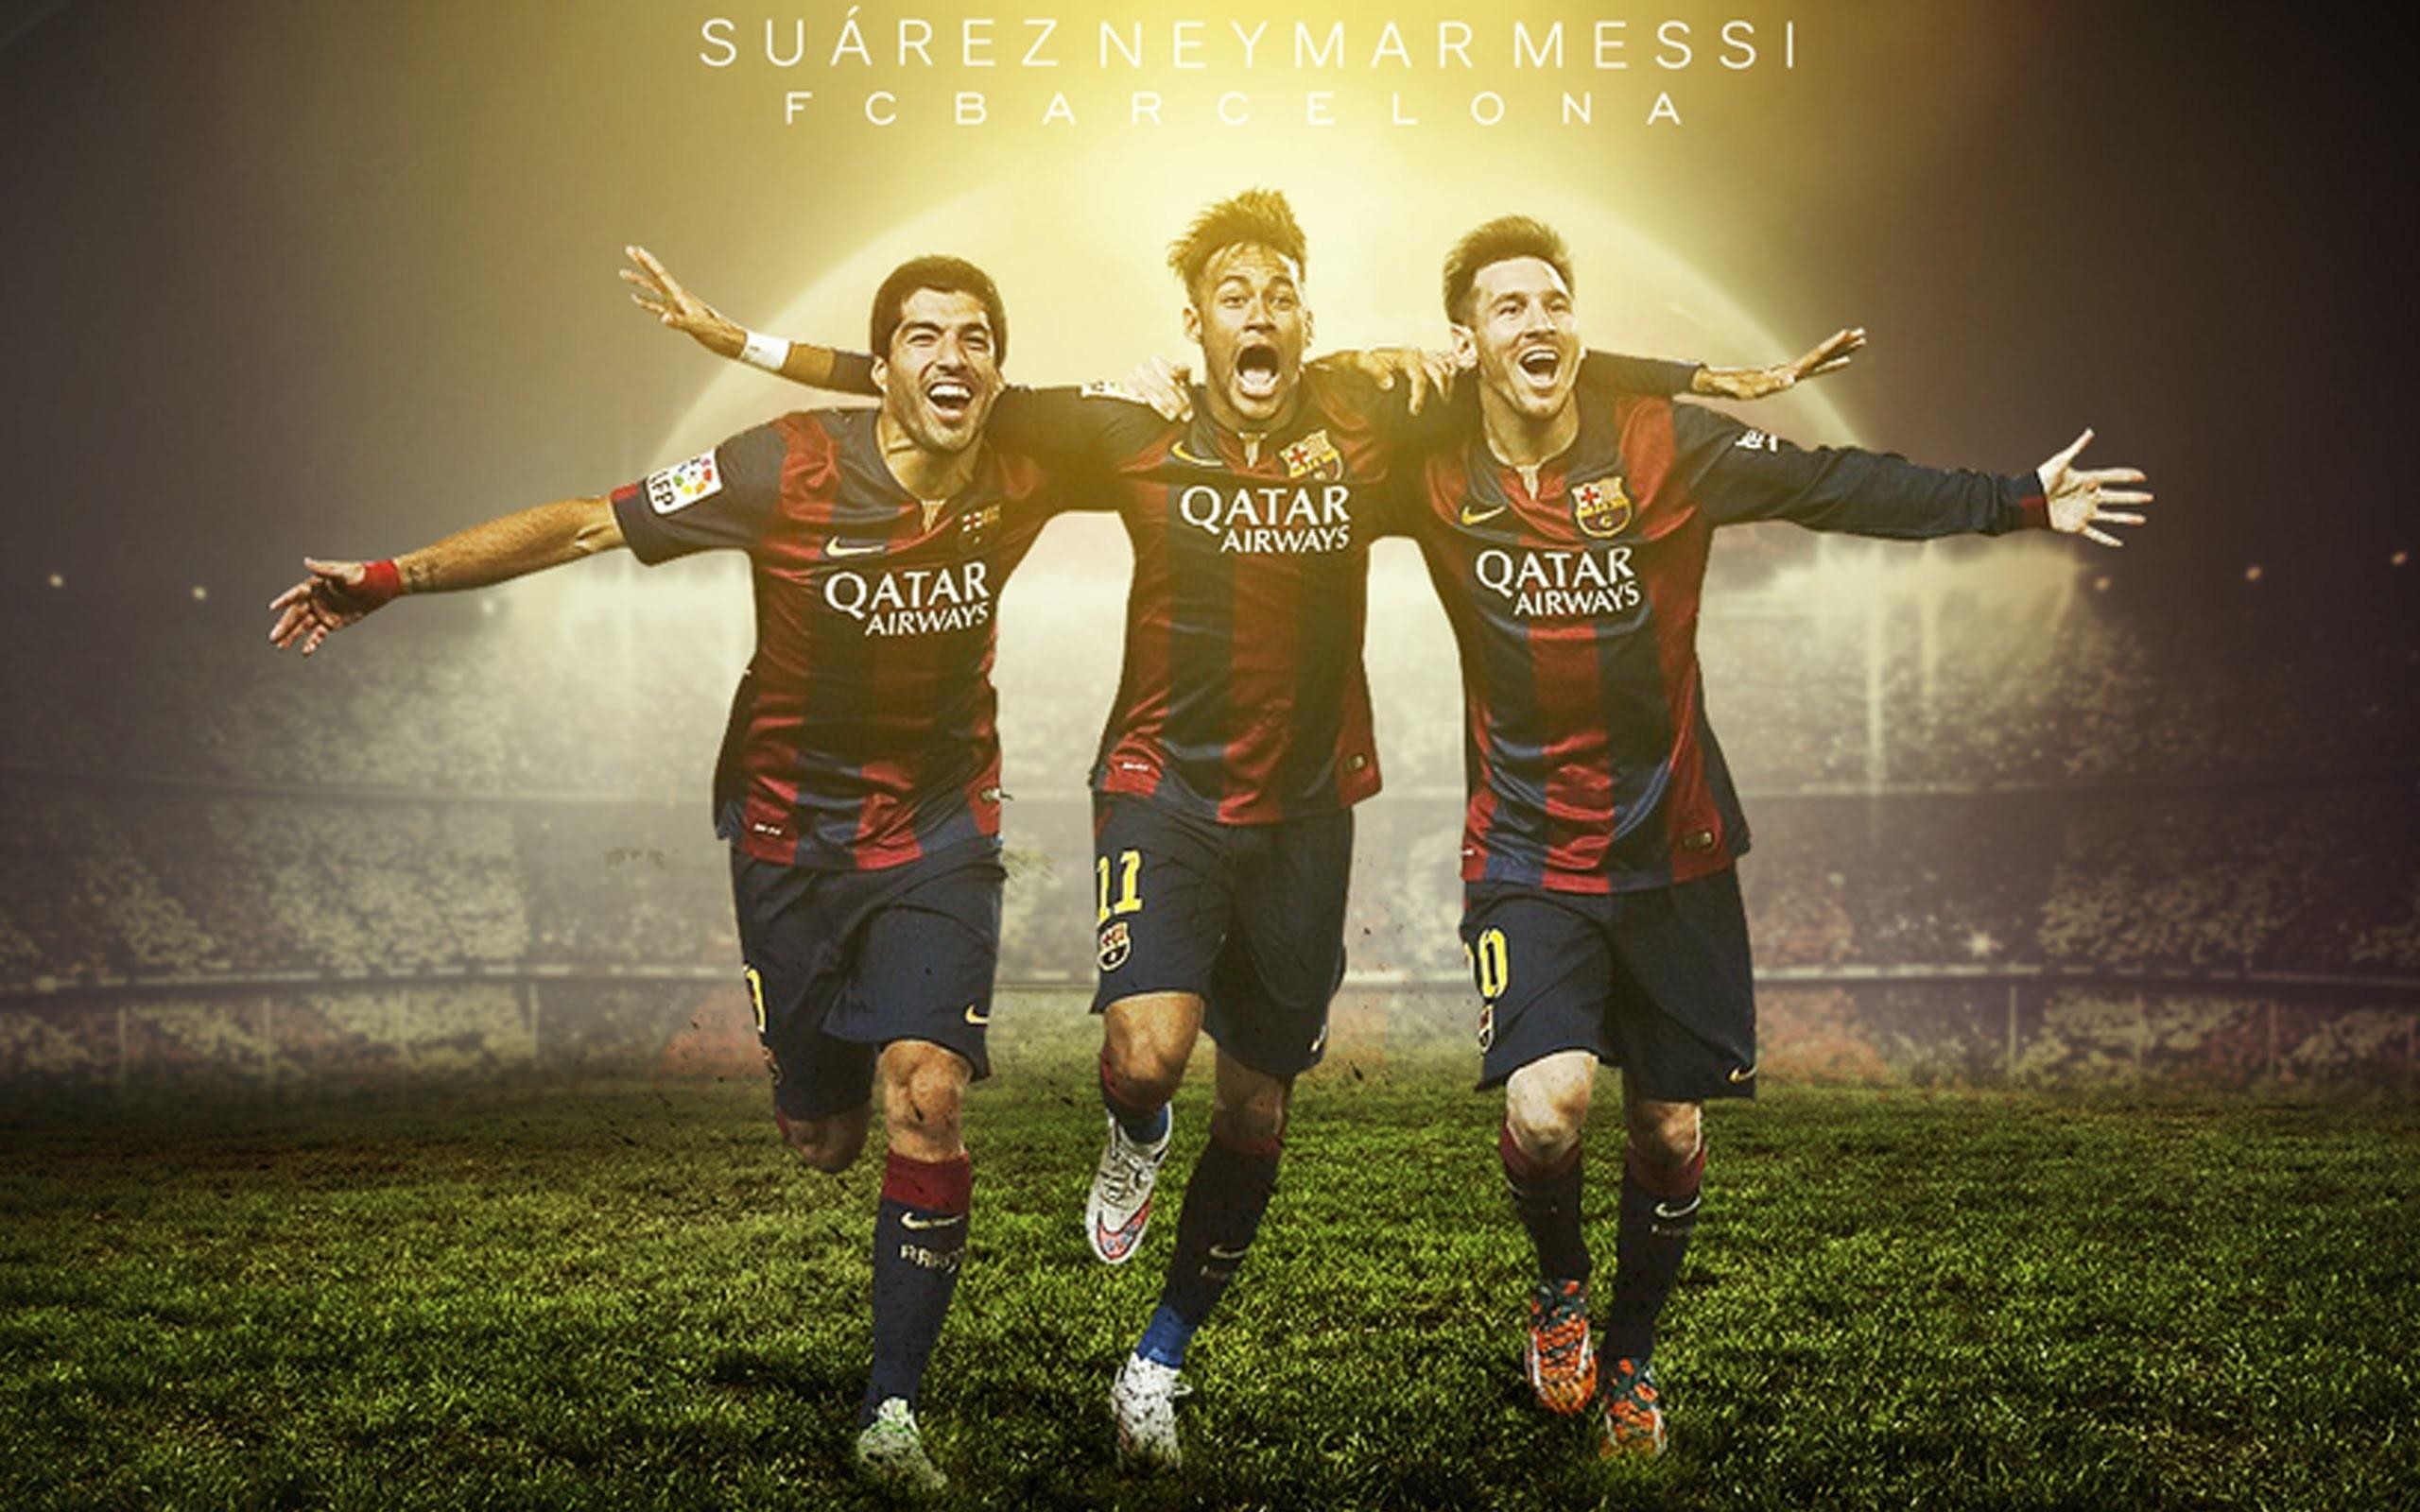 1920x1080 Messi Vs Ronaldo RAP BATTLE El Clasico 2016 Preview Barcelona Real Madrid